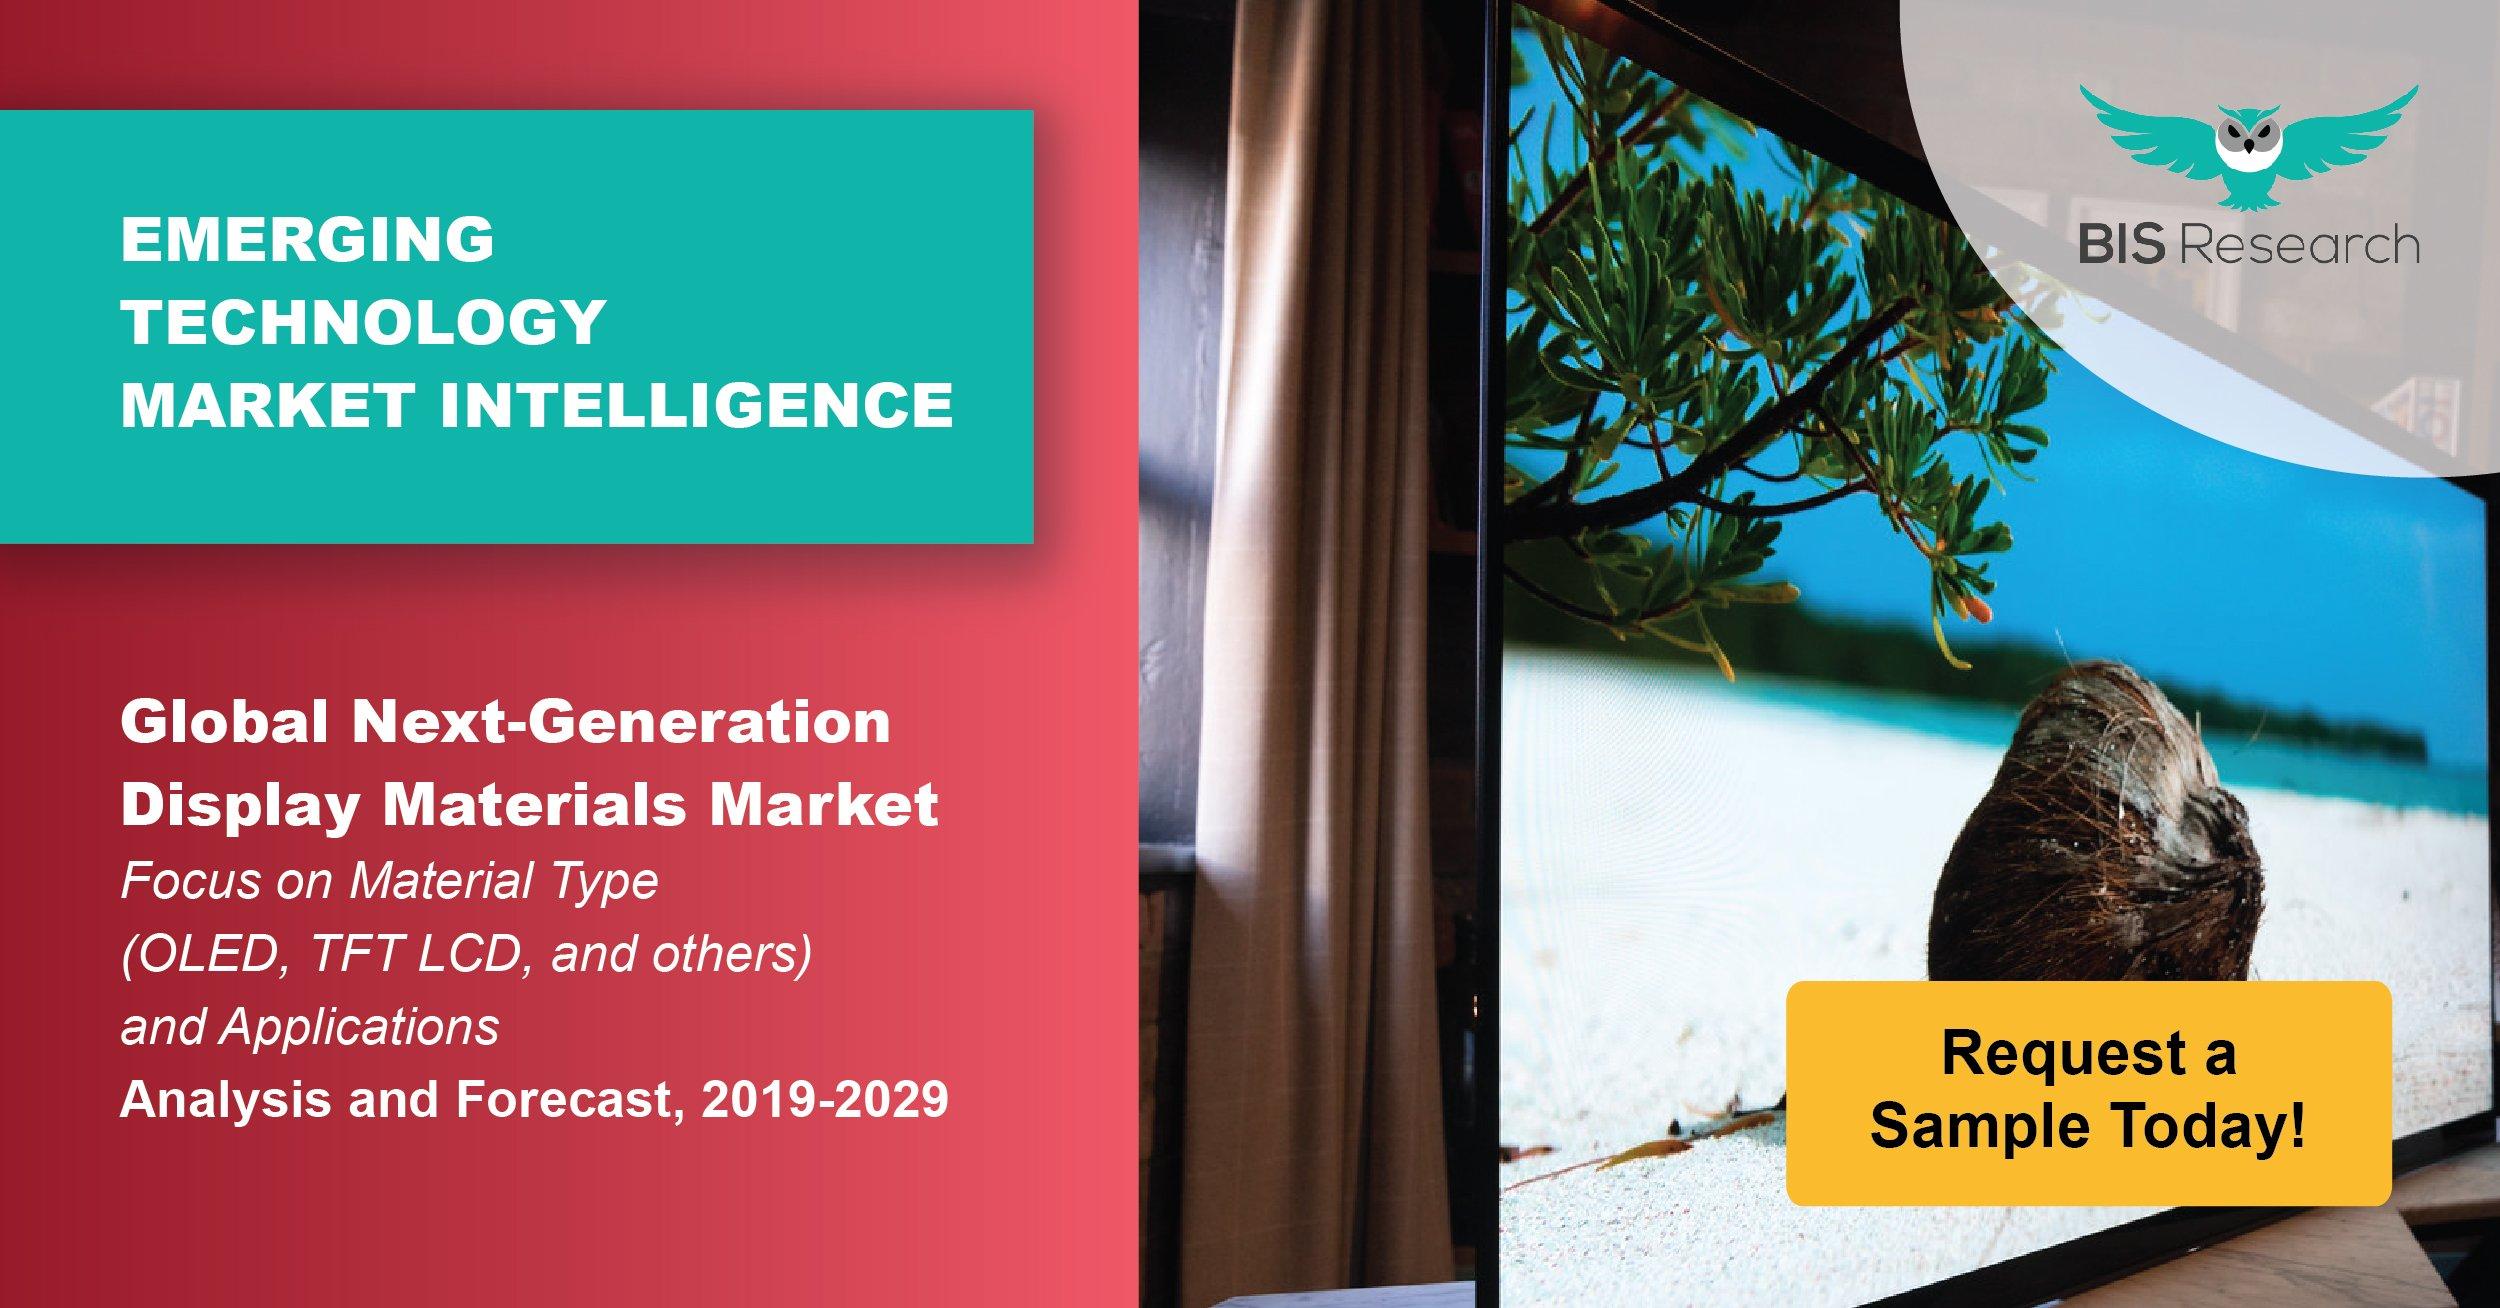 Next-Generation Display Materials Market